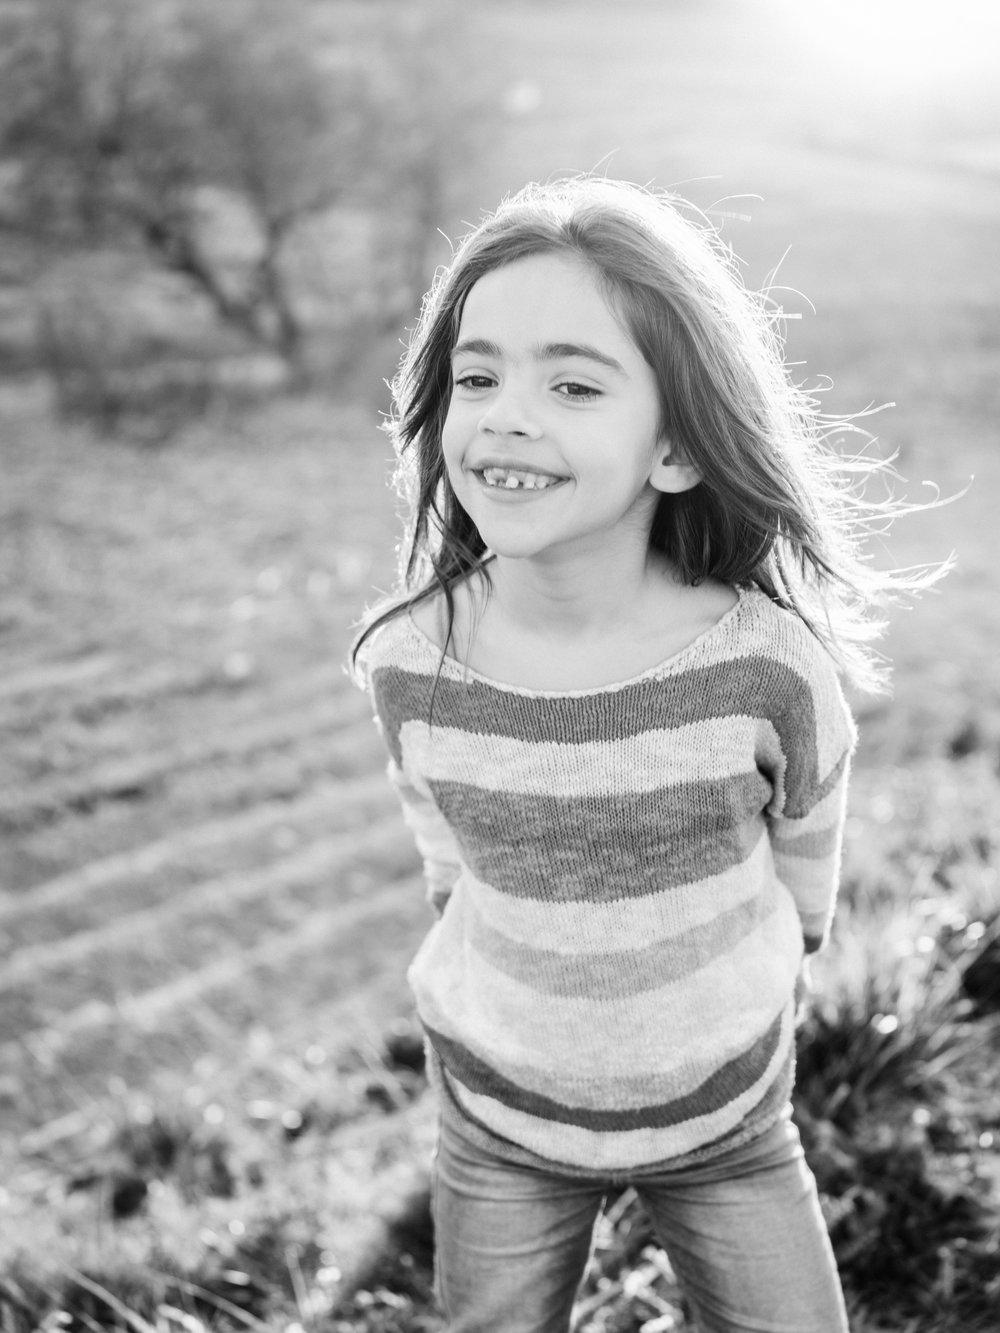 fotografia-infantil-familiar13.jpg